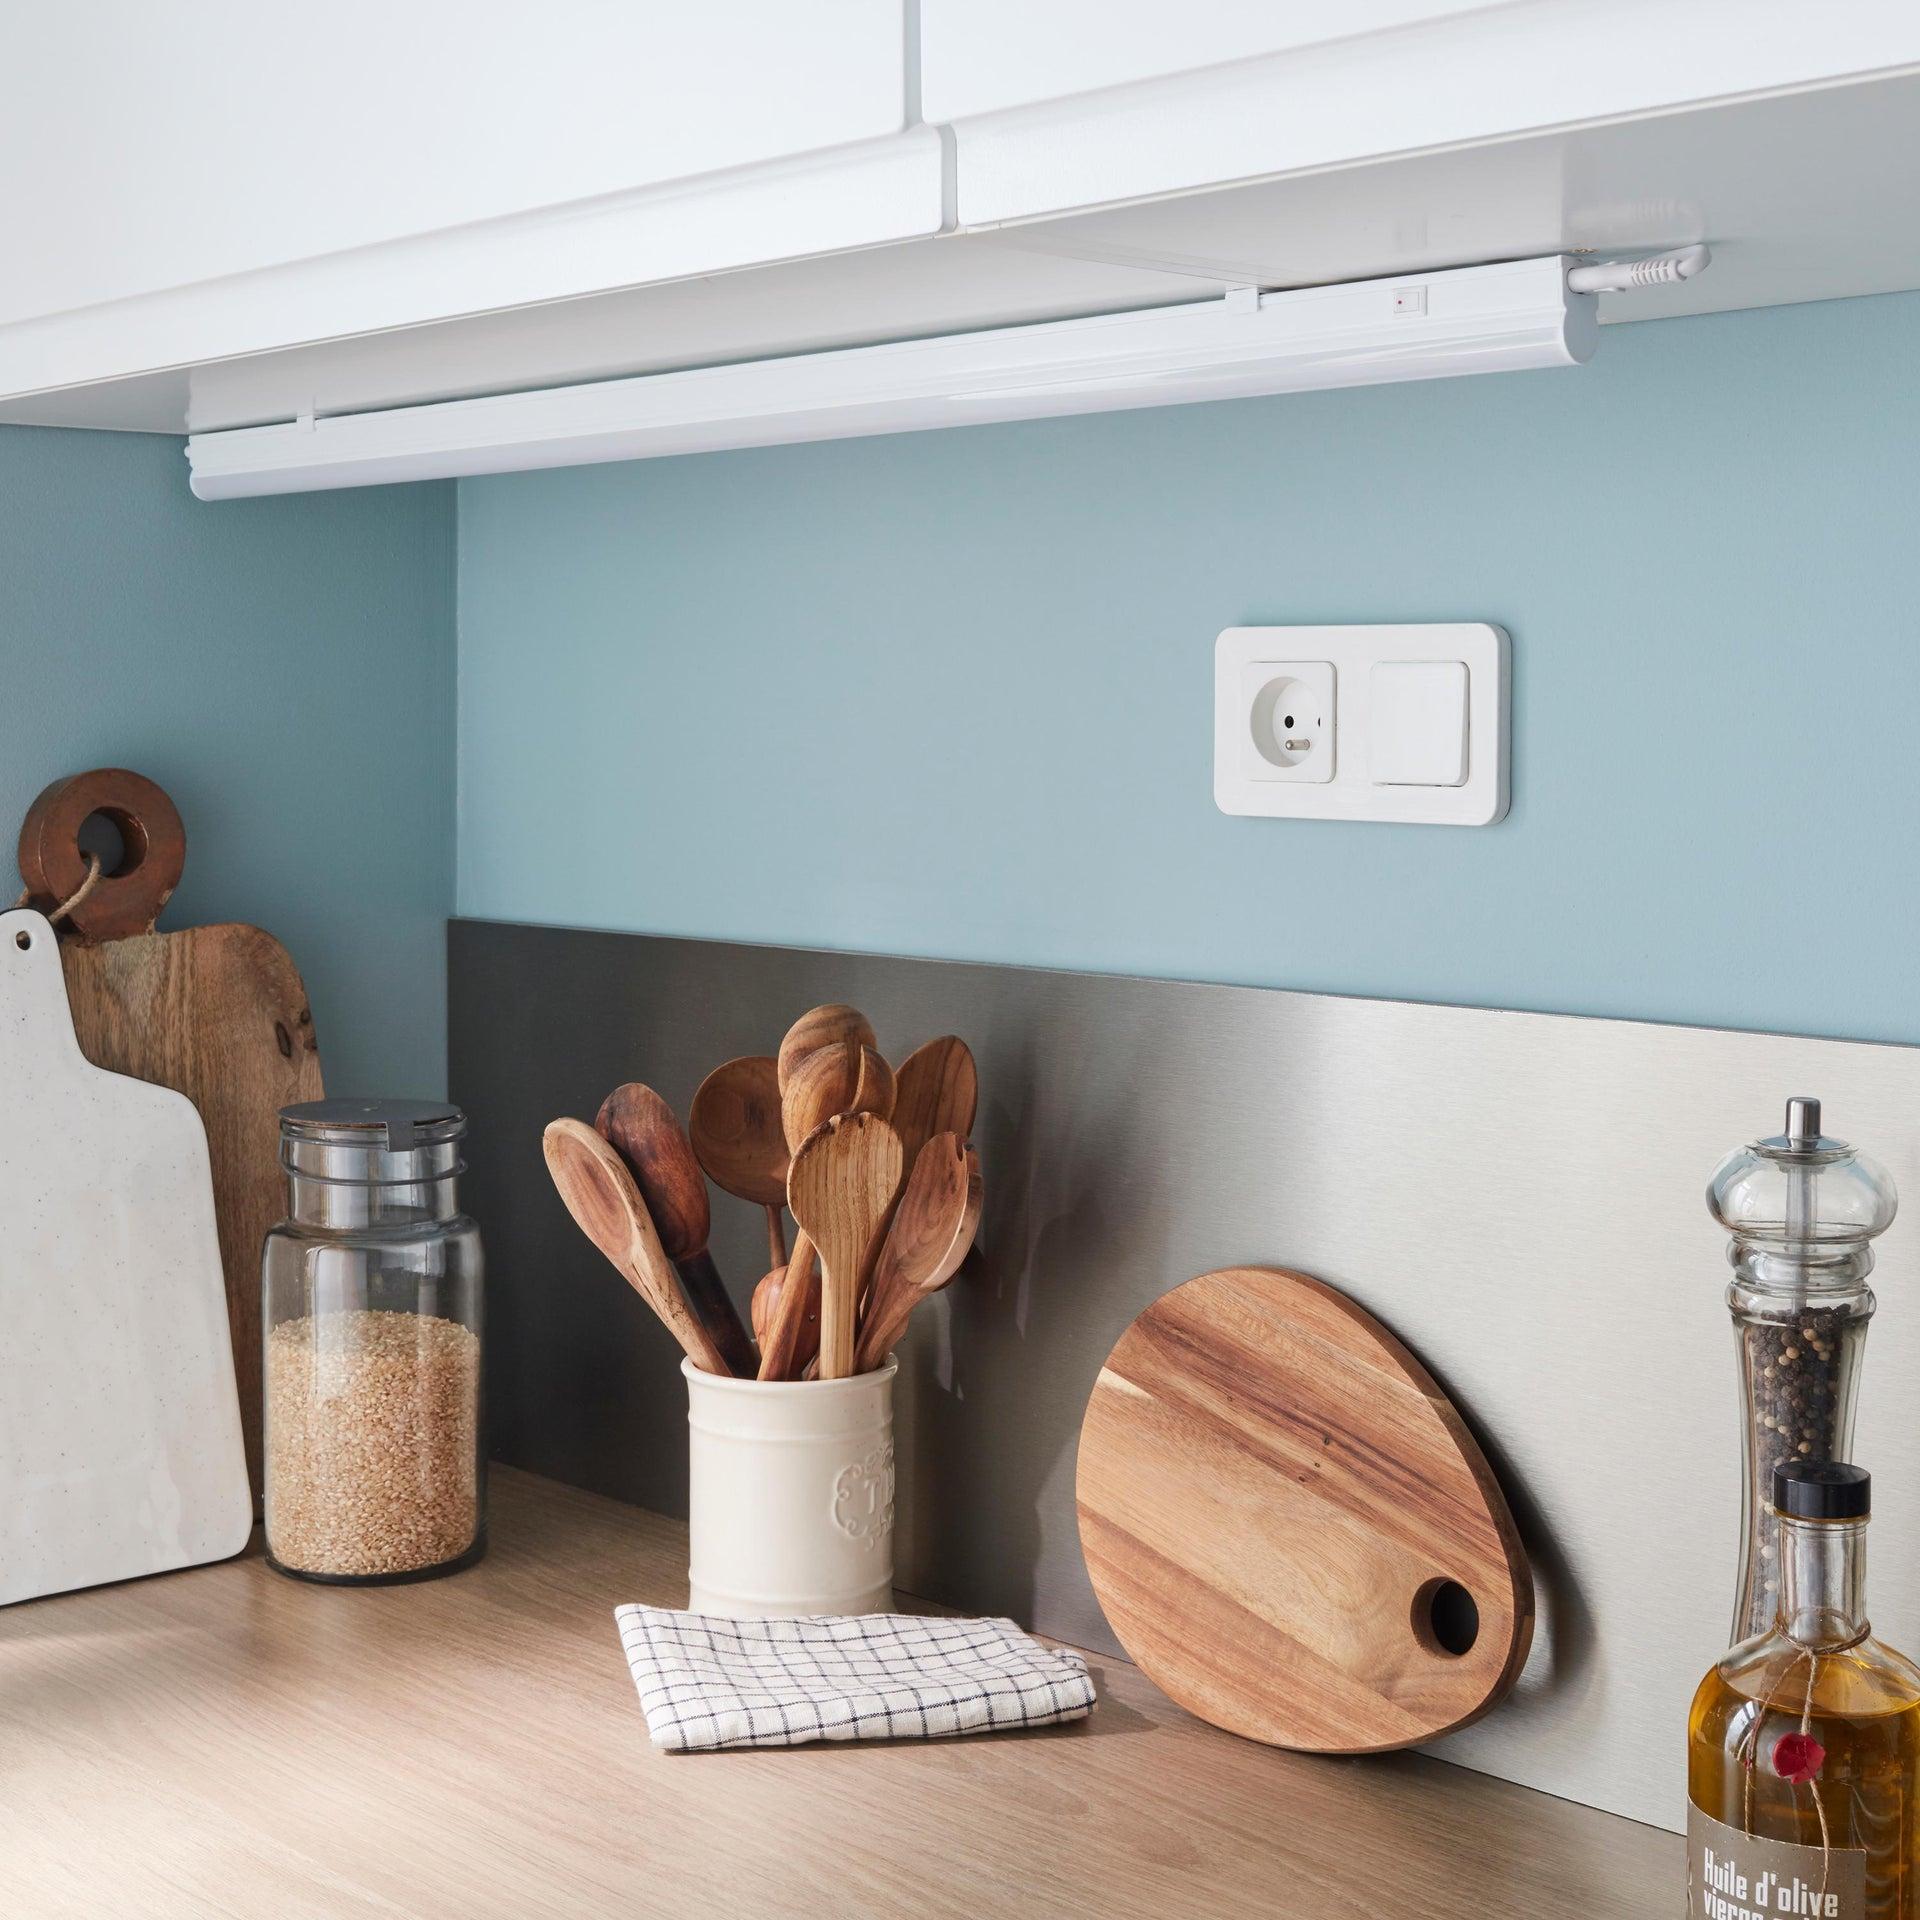 Reglette Moss LED integrato 90.9 cm 11W 1250LM IP20 Inspire - 4